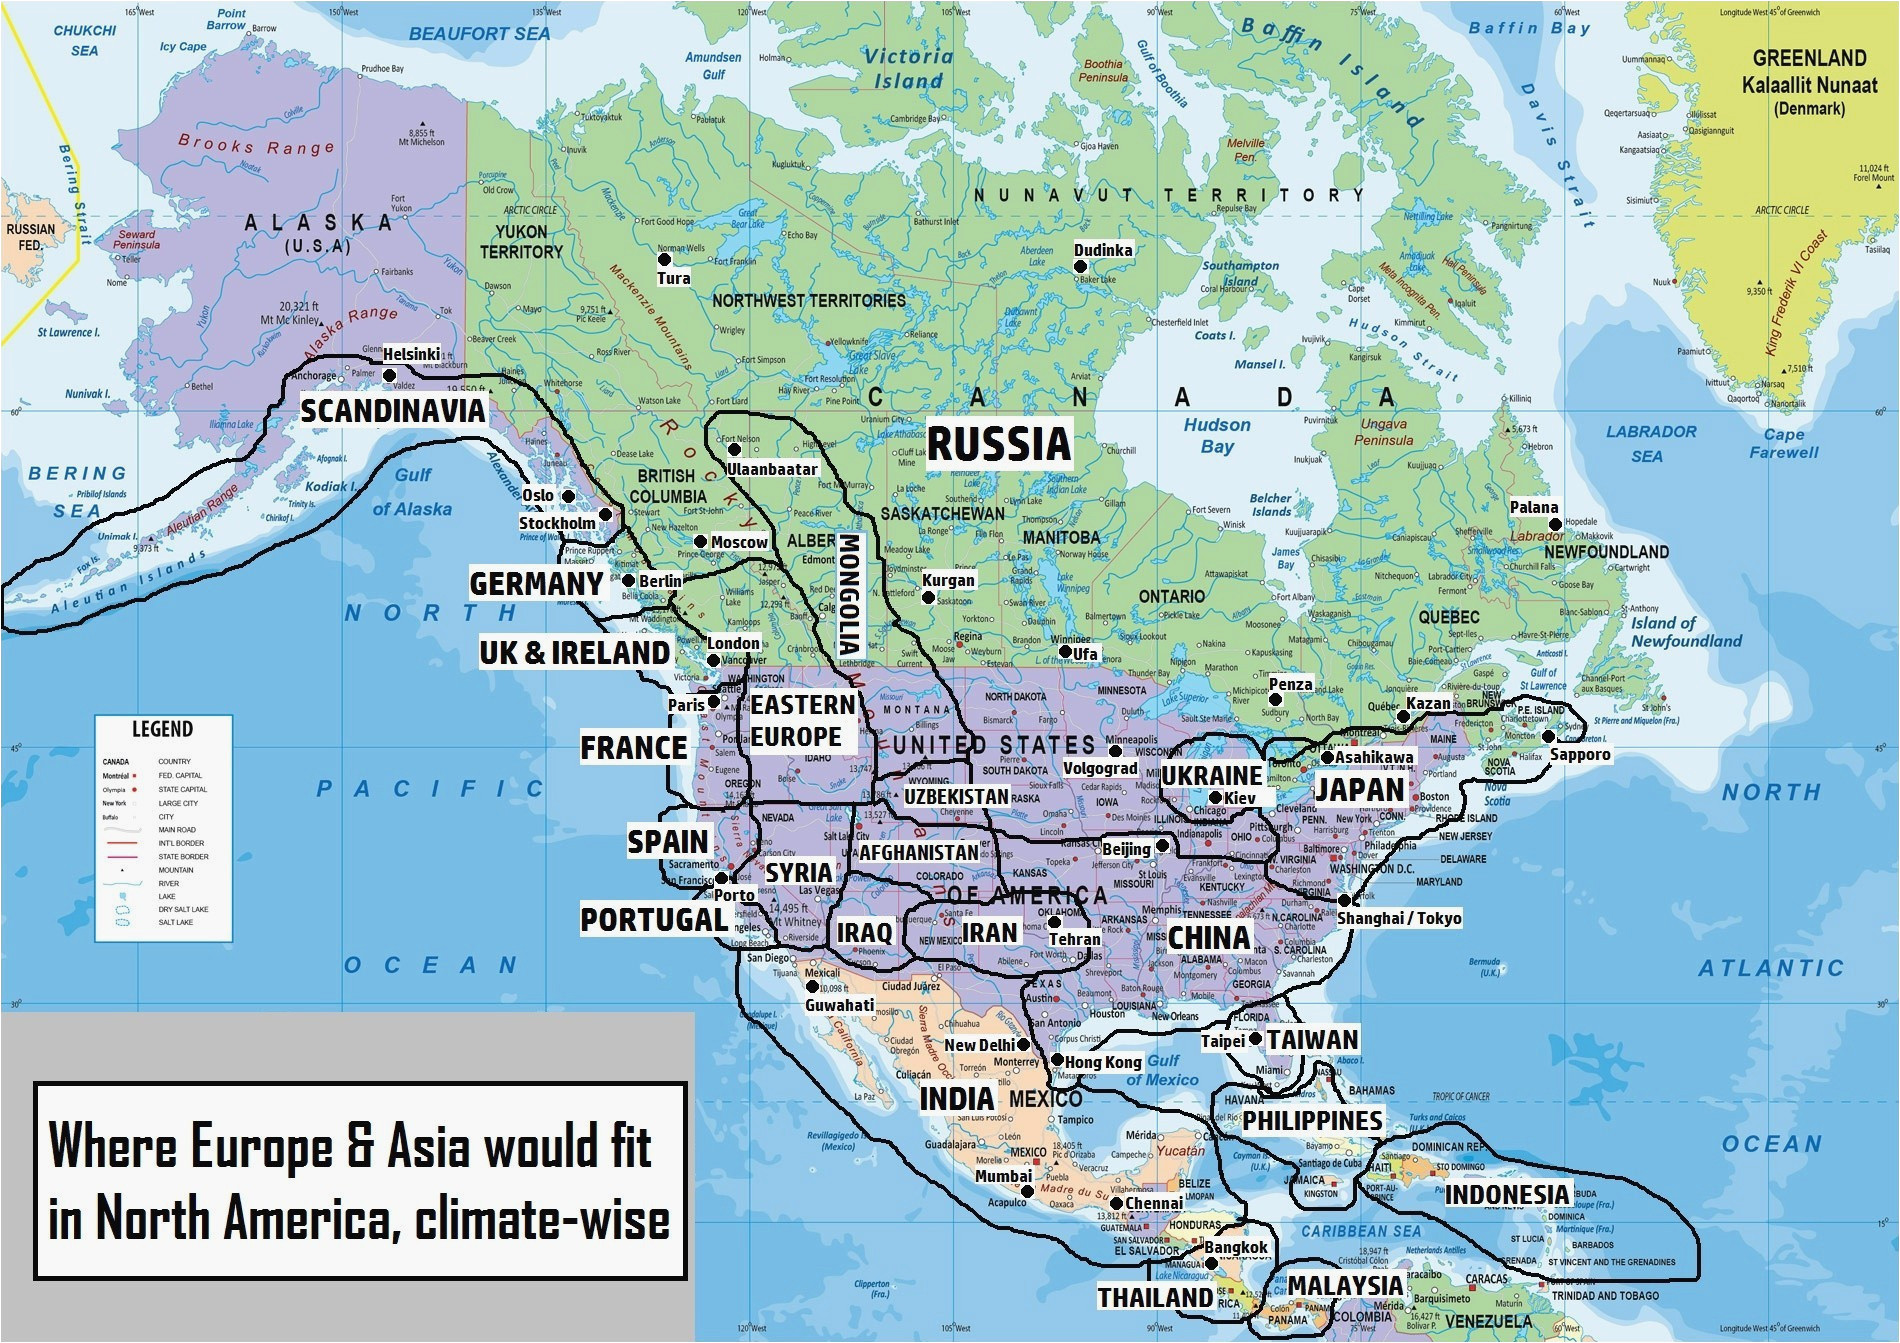 Map Of Texas Capitol.Texas Capitol Map Map Of Arizona Showing Cities Secretmuseum